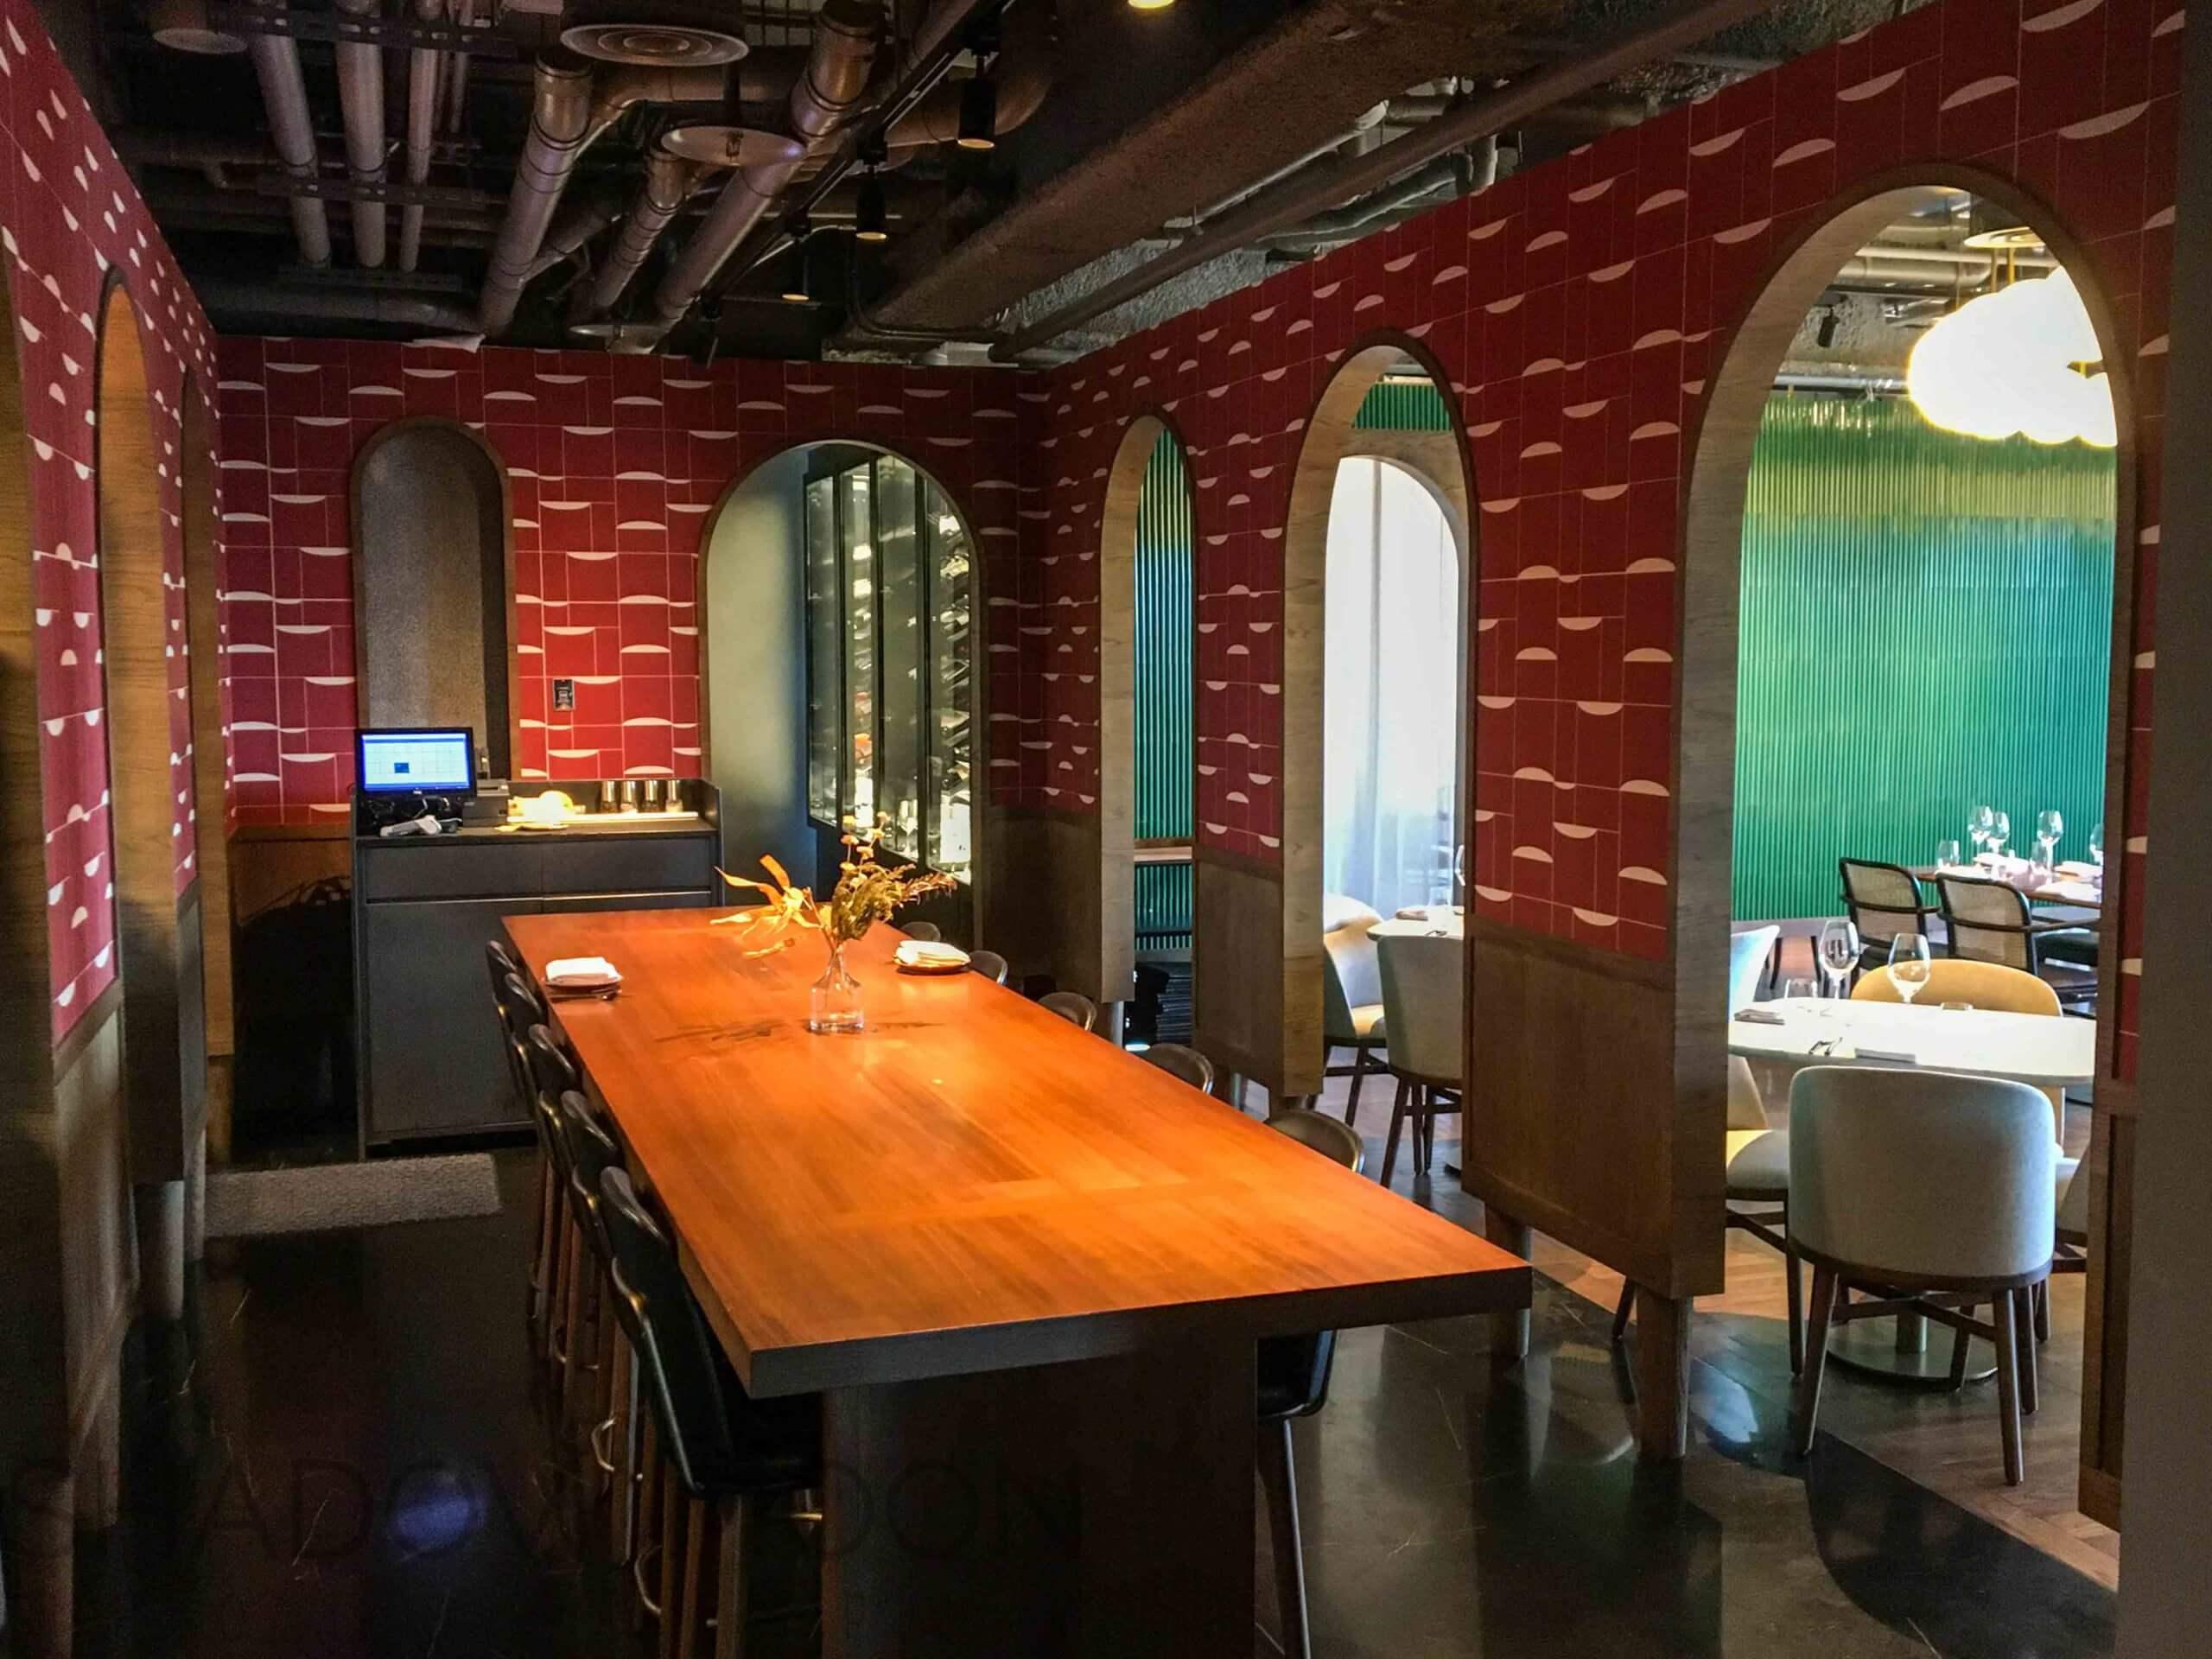 The Tavernist 餐酒館